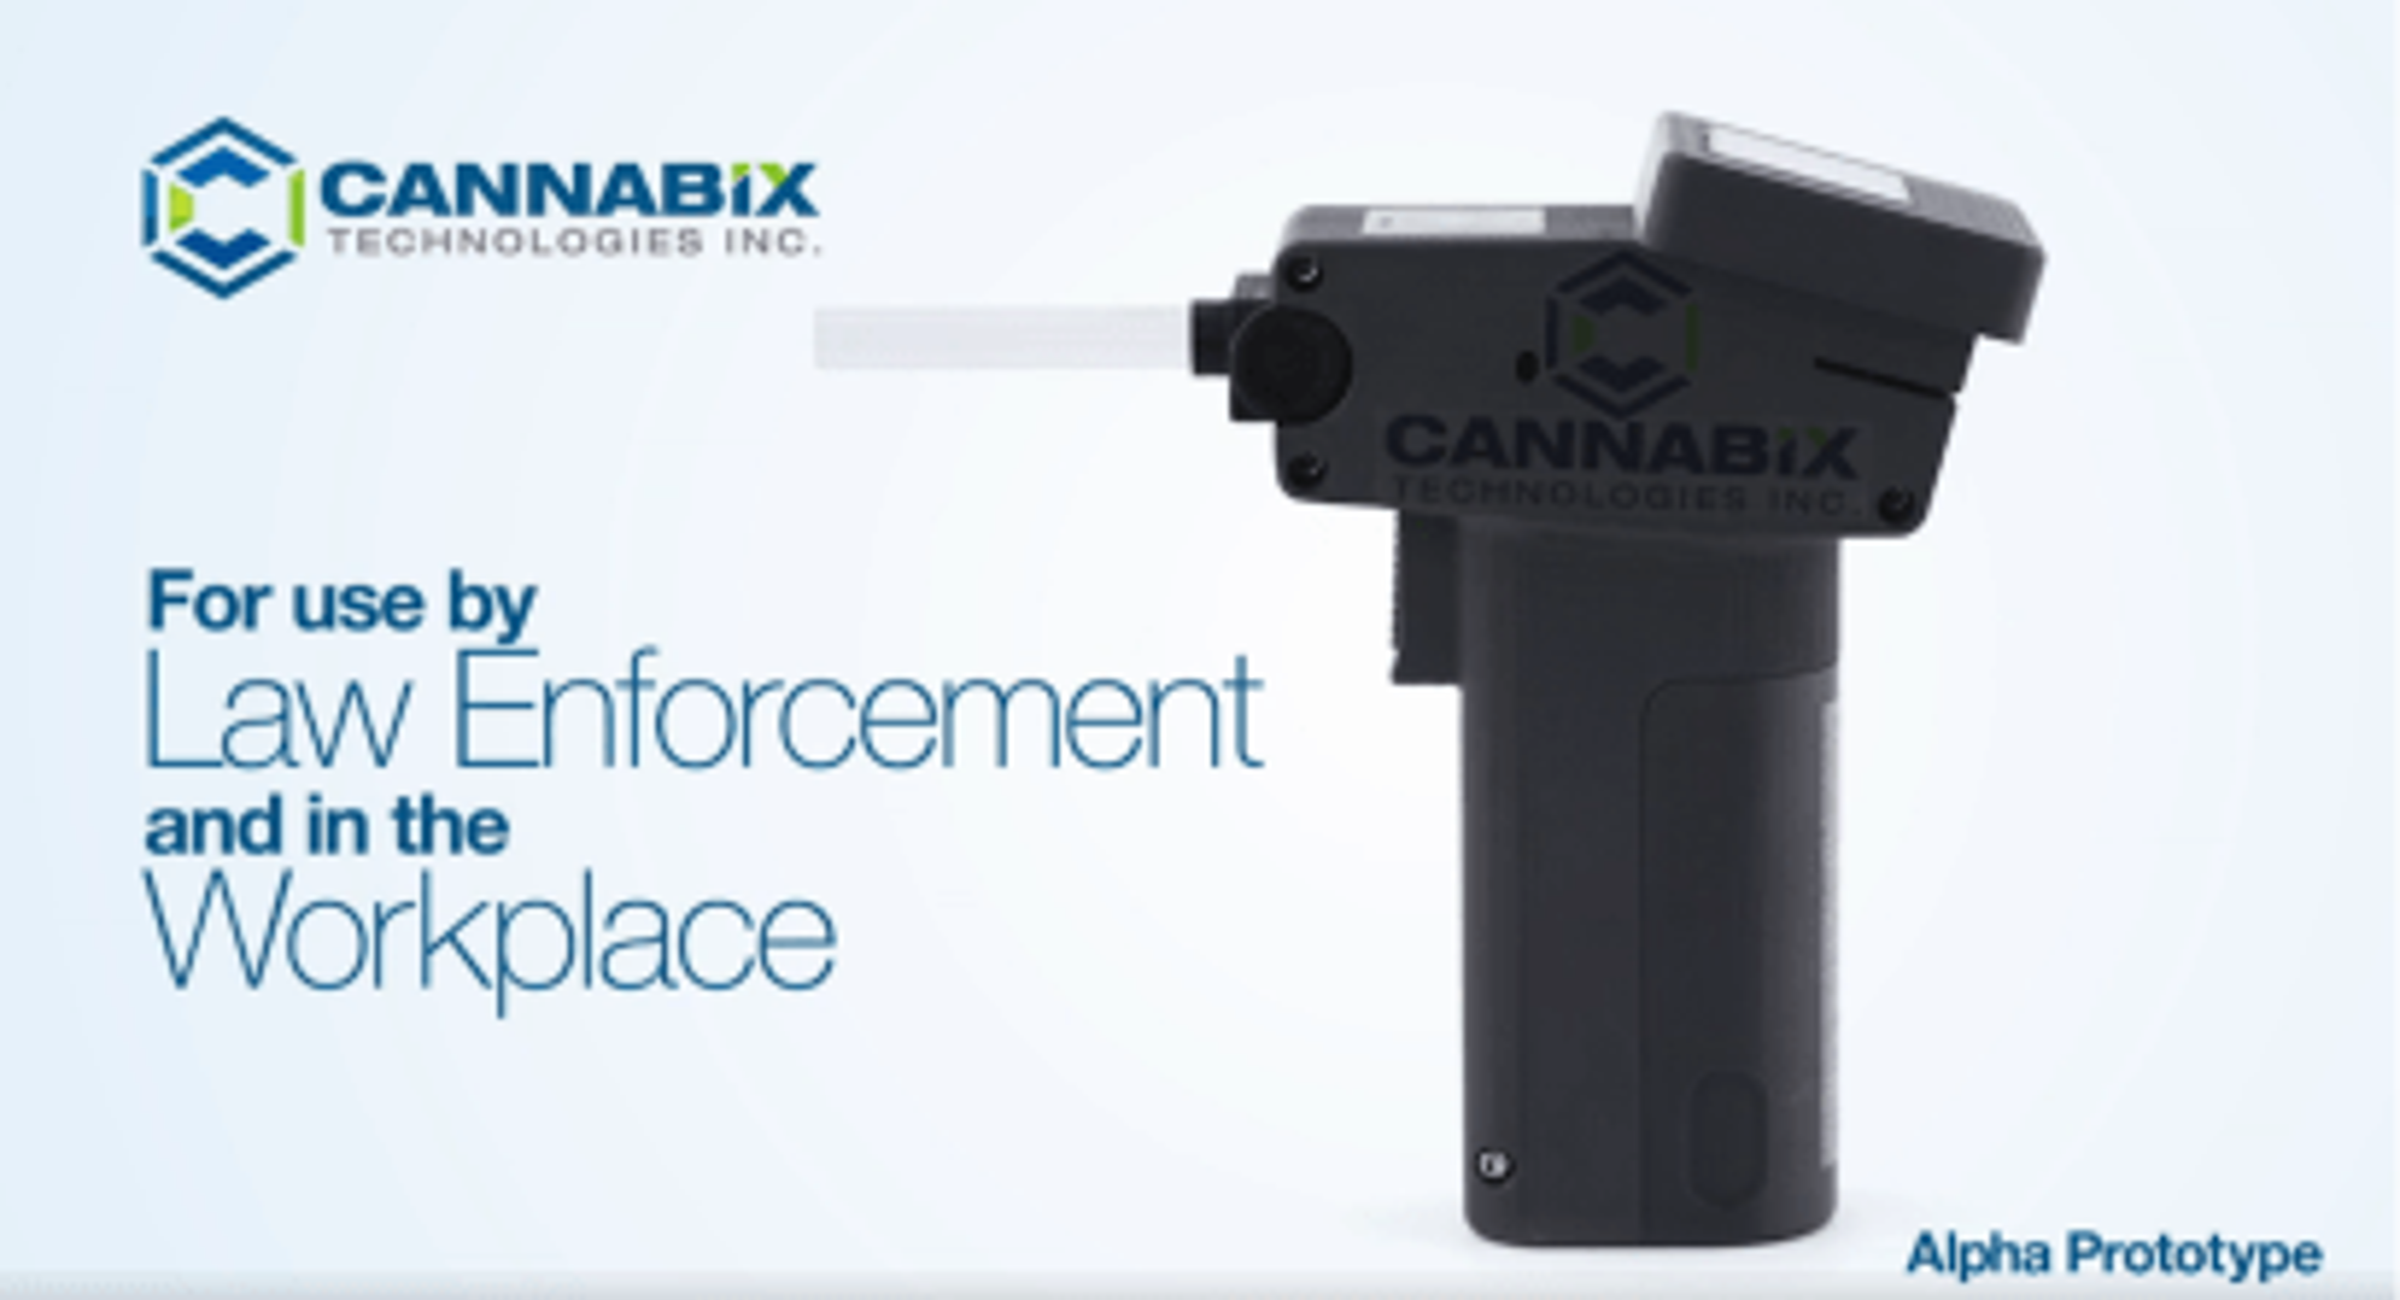 Cannabix prototype